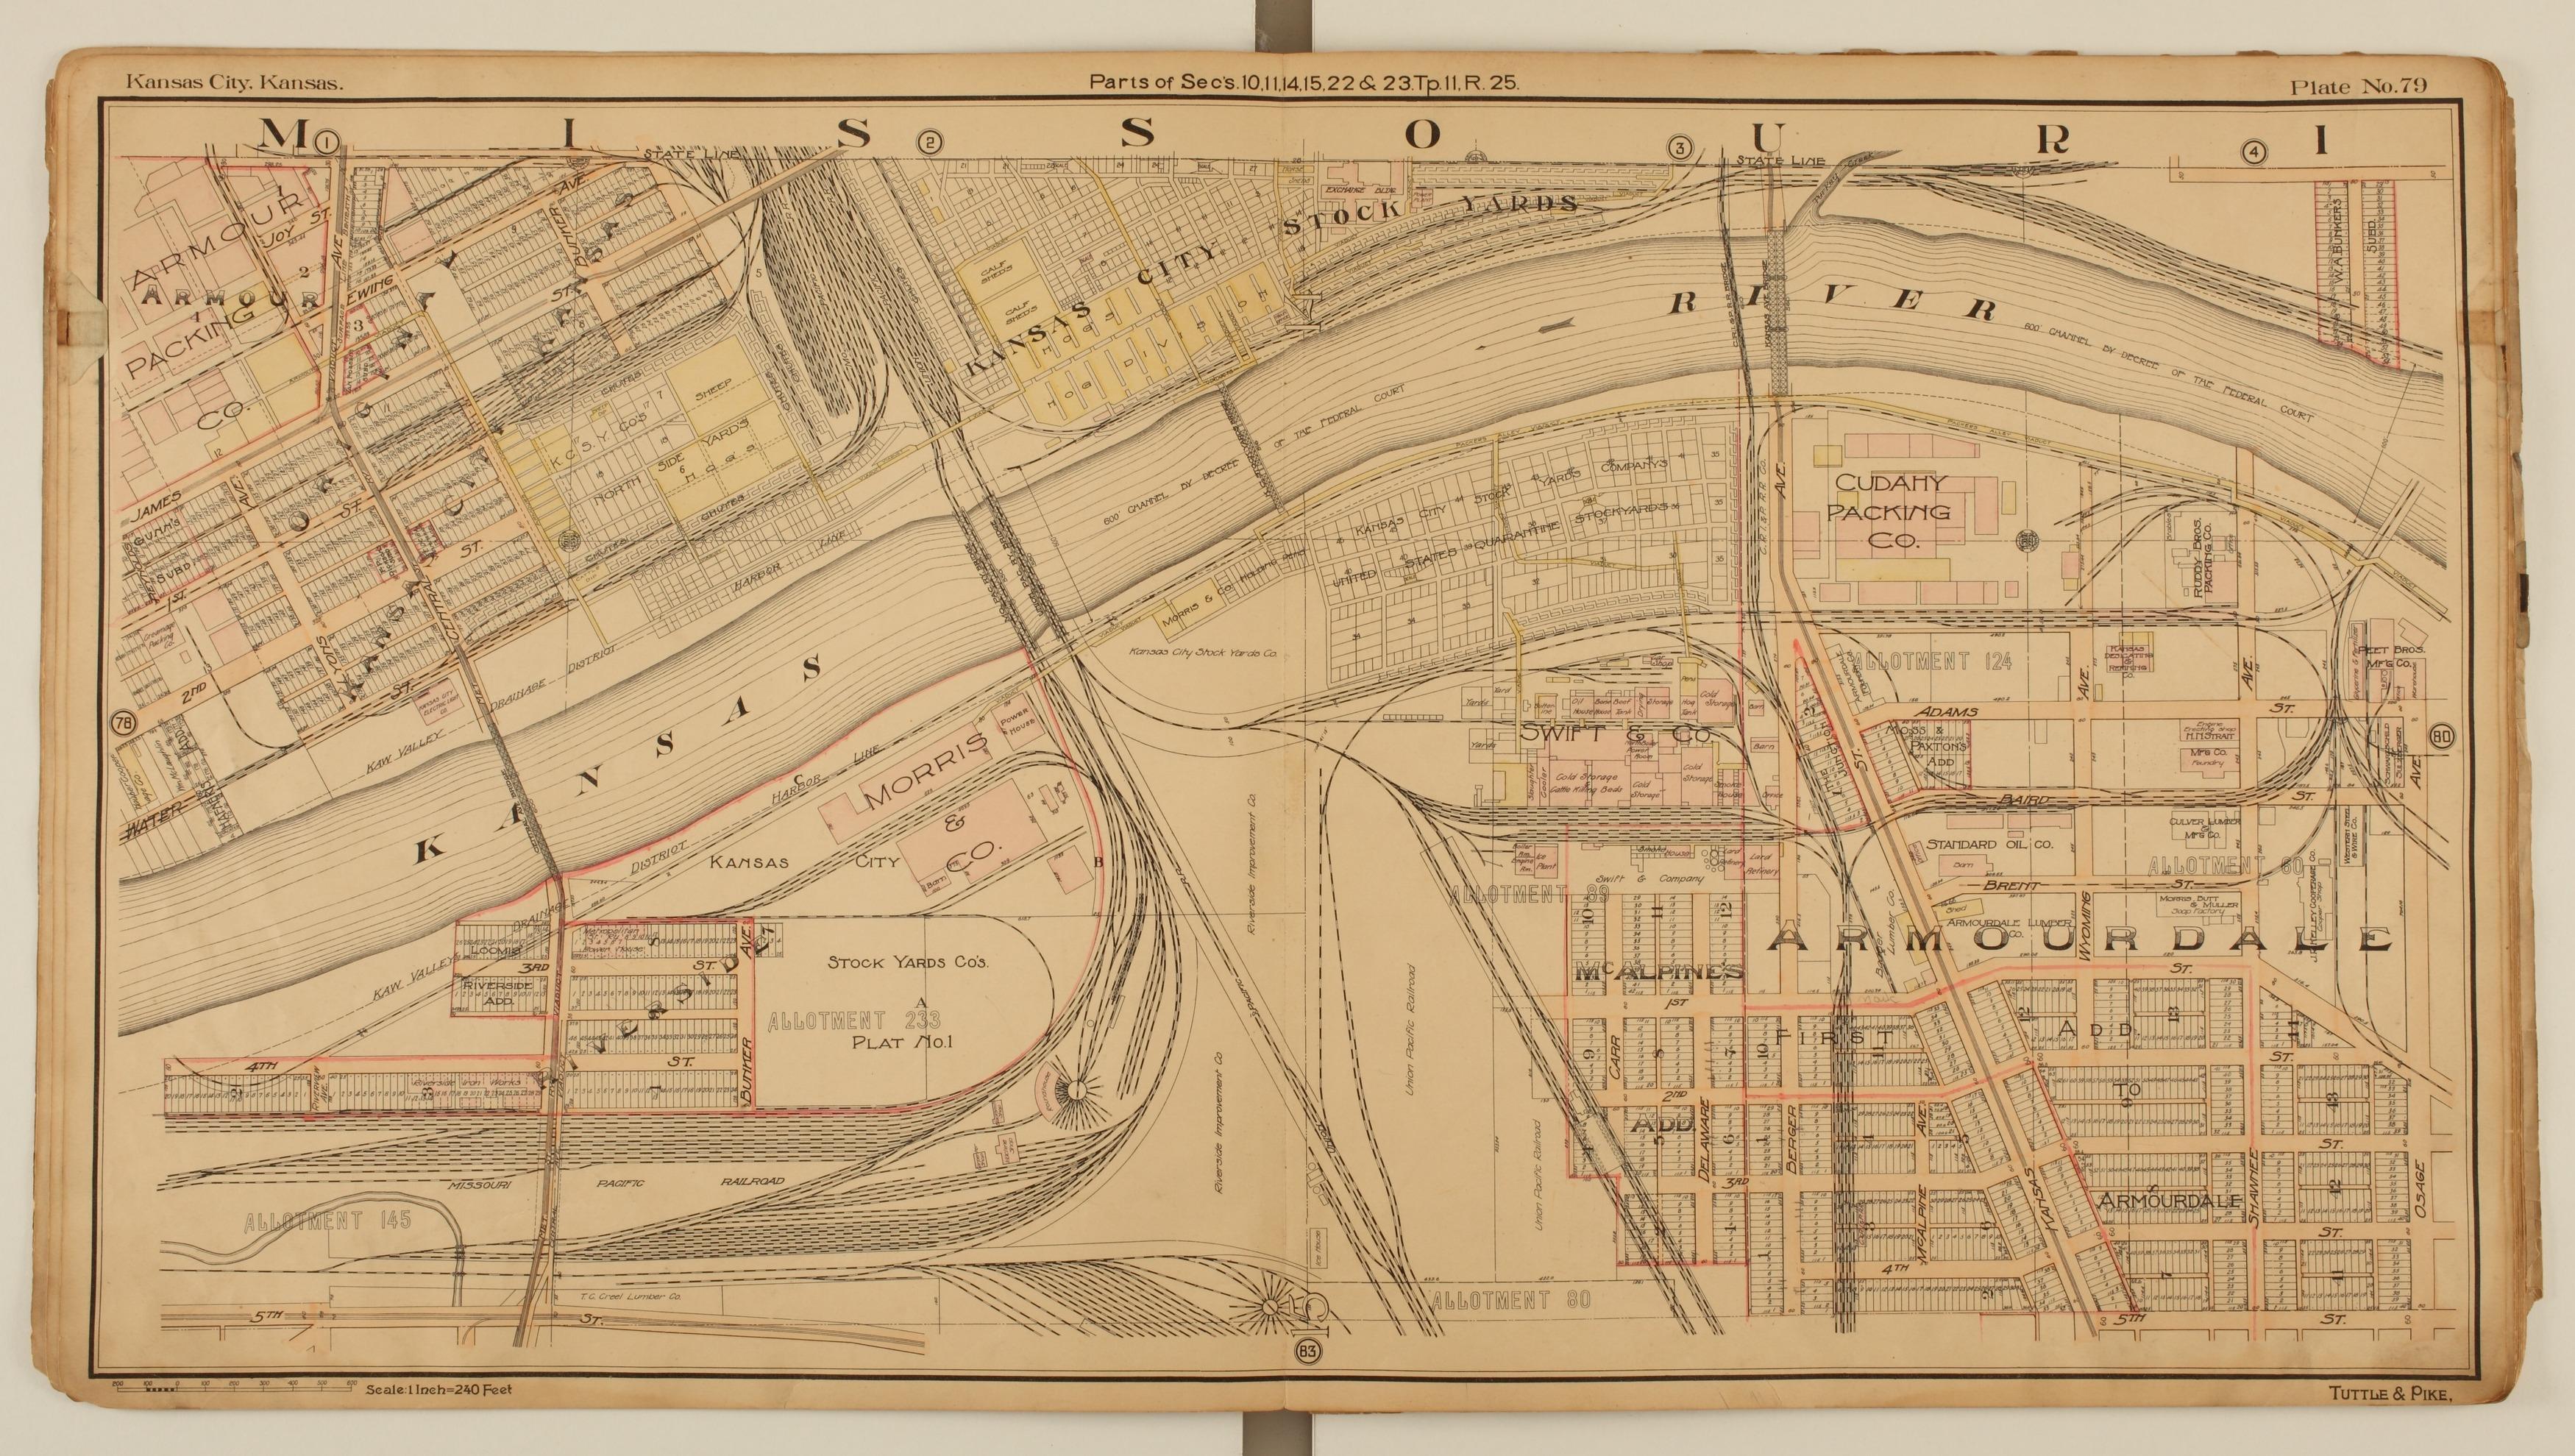 Tuttle and Pike's atlas of Kansas City, Kansas - 5